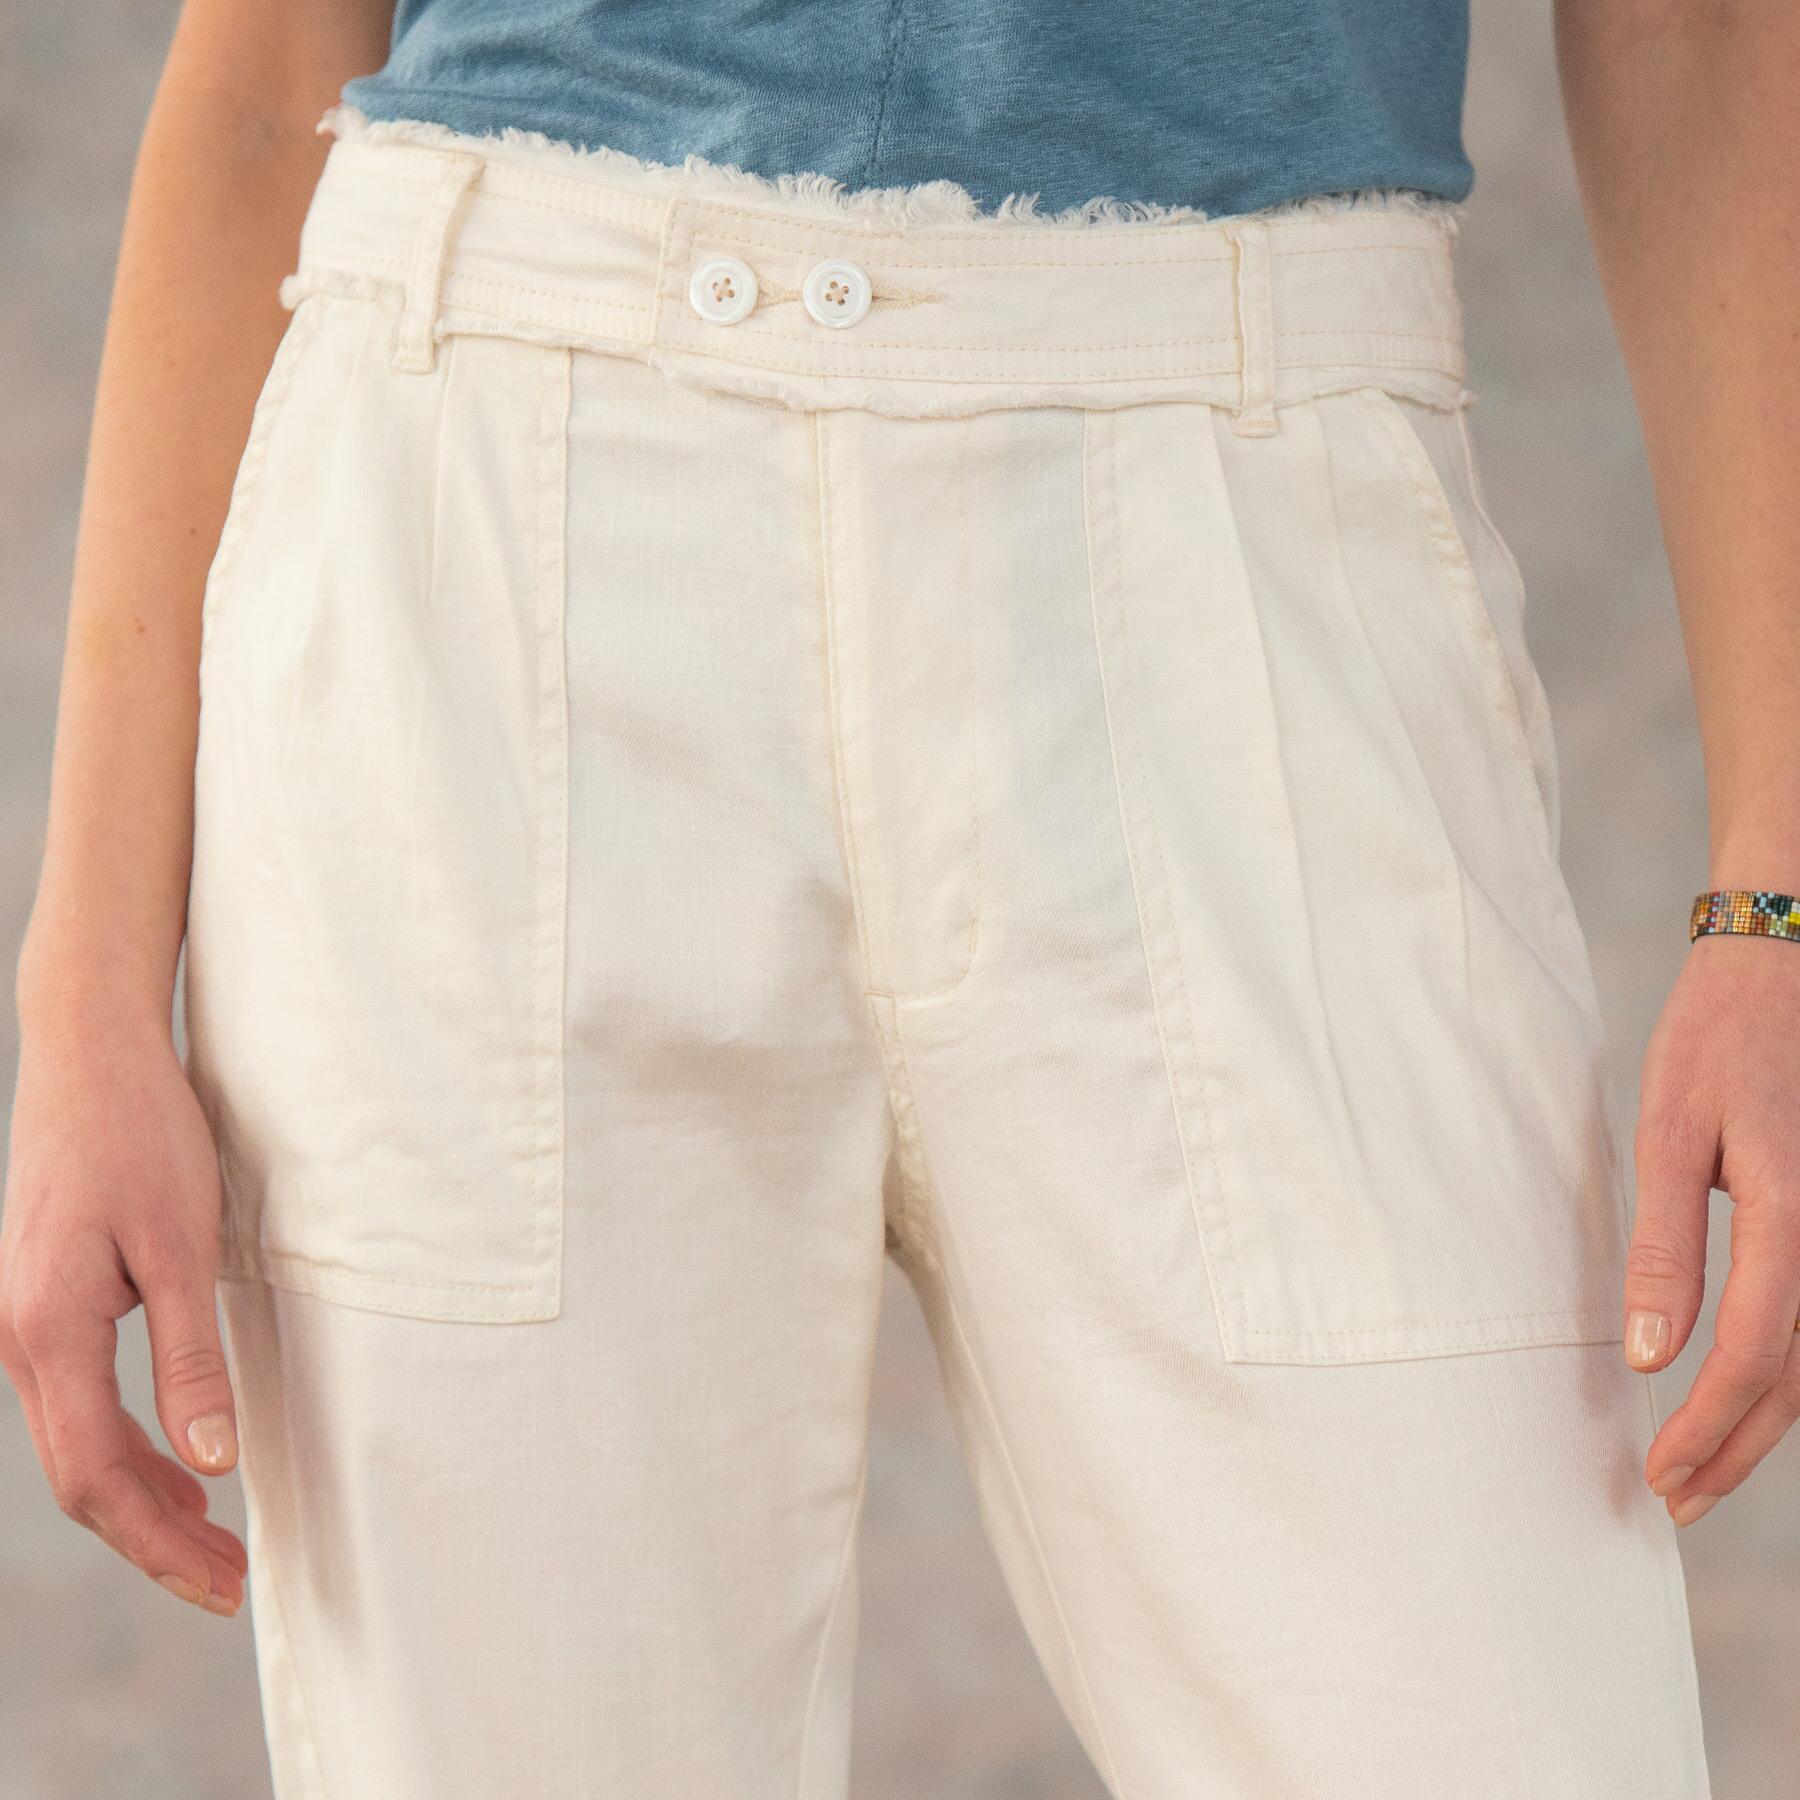 DORSEY PANTS - PETITES: View 4